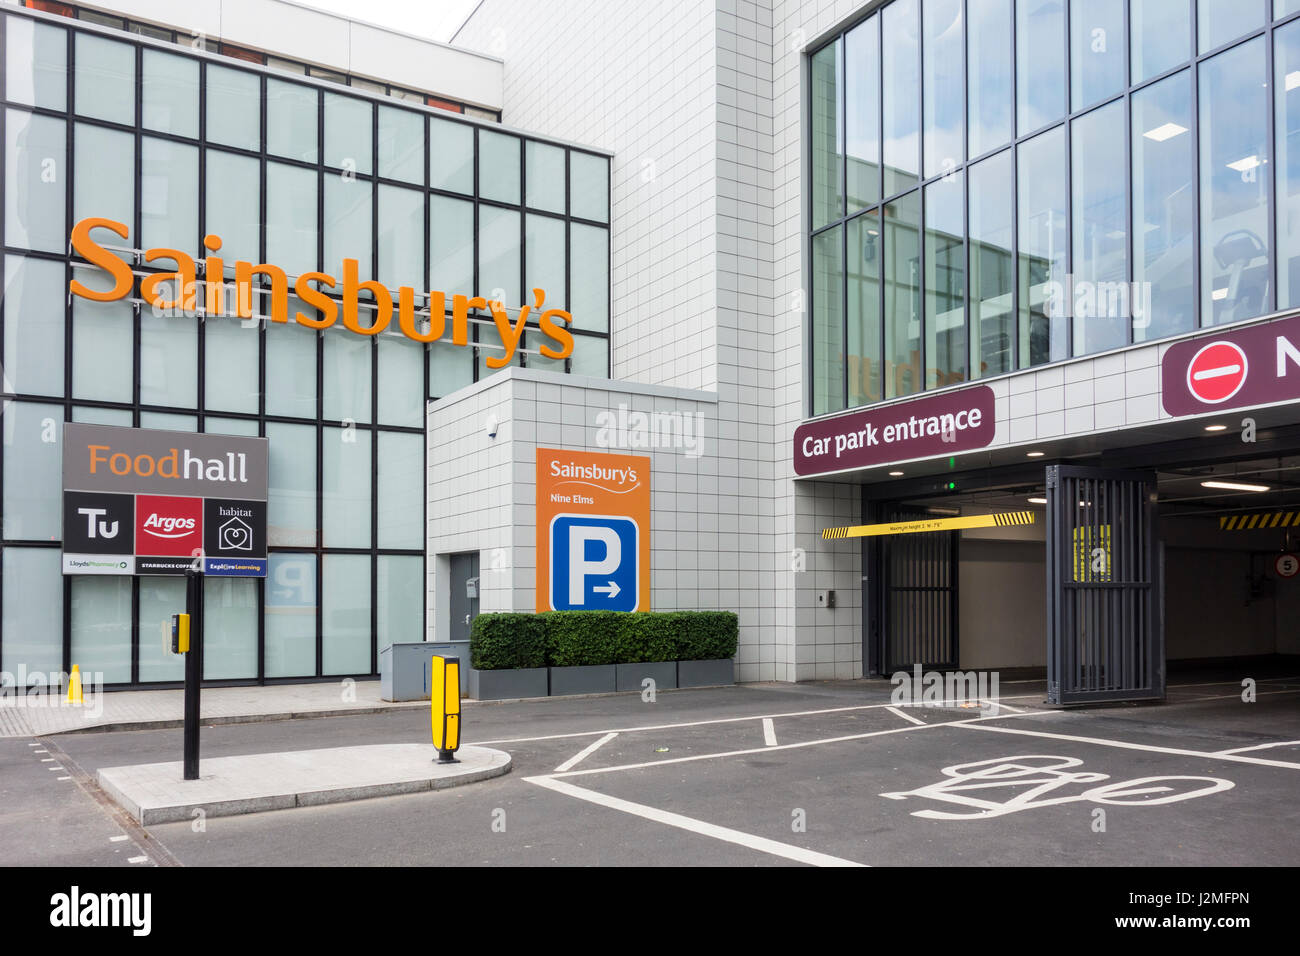 Kensigton Sainsbury Car Park